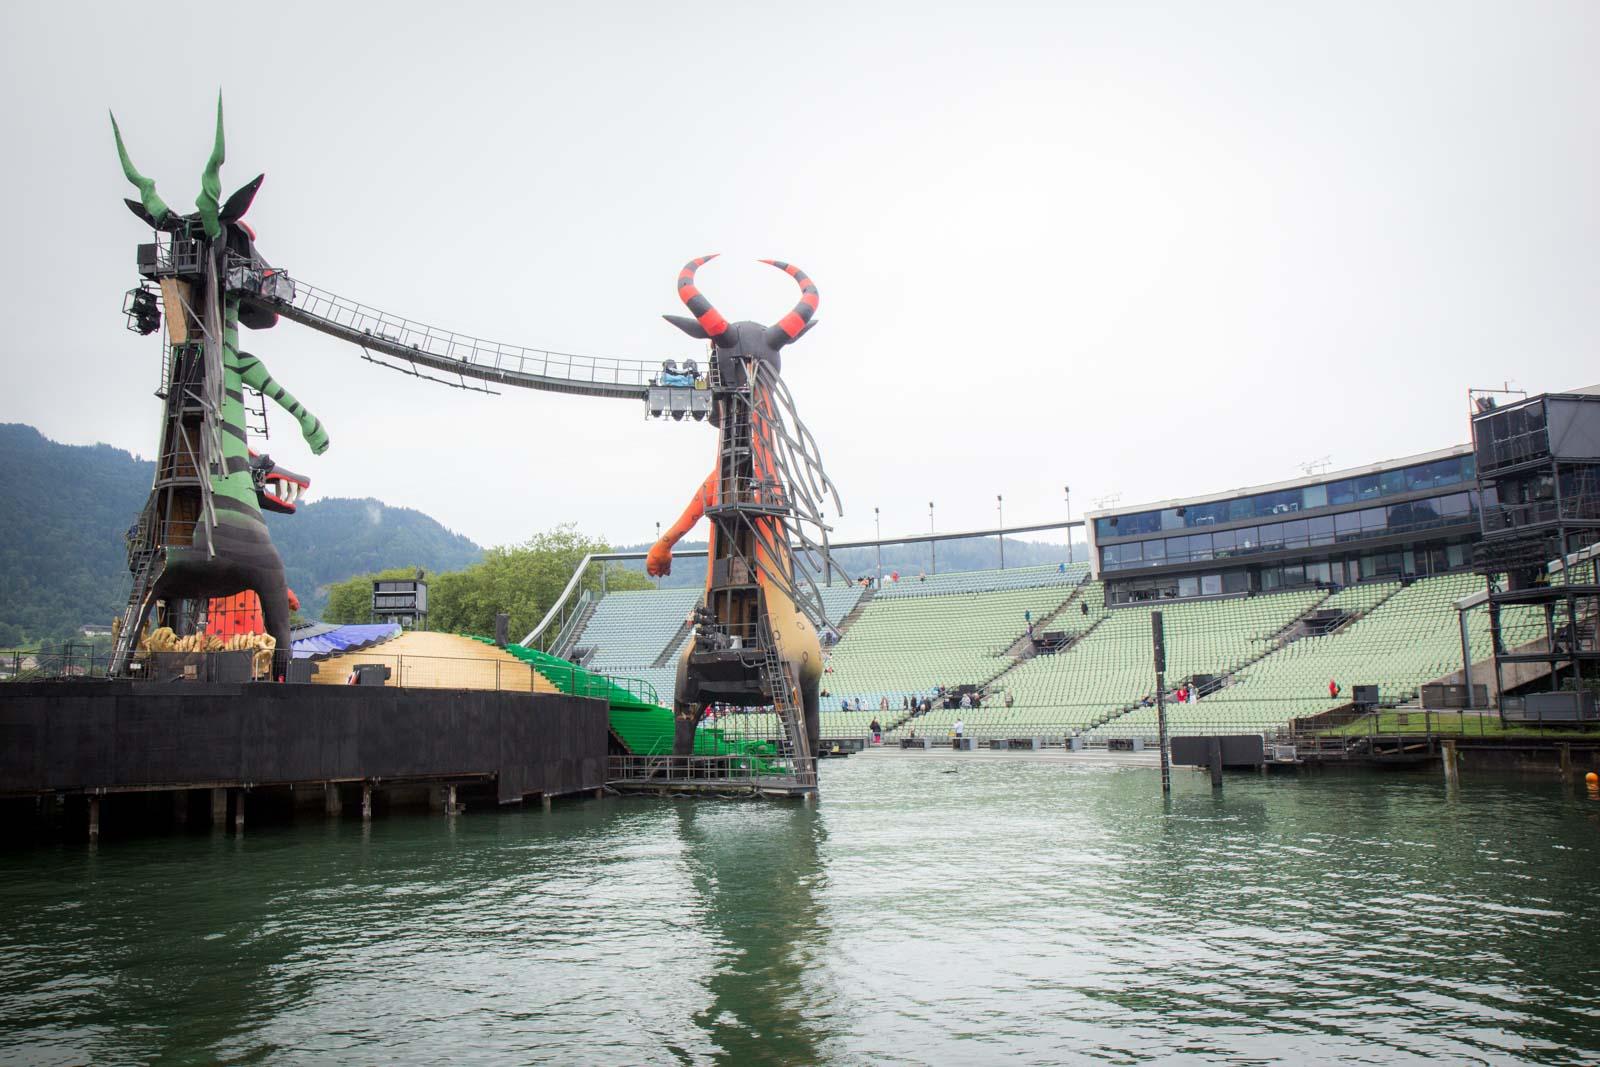 Behind the scenes, lake stage, bregenz festival, austria